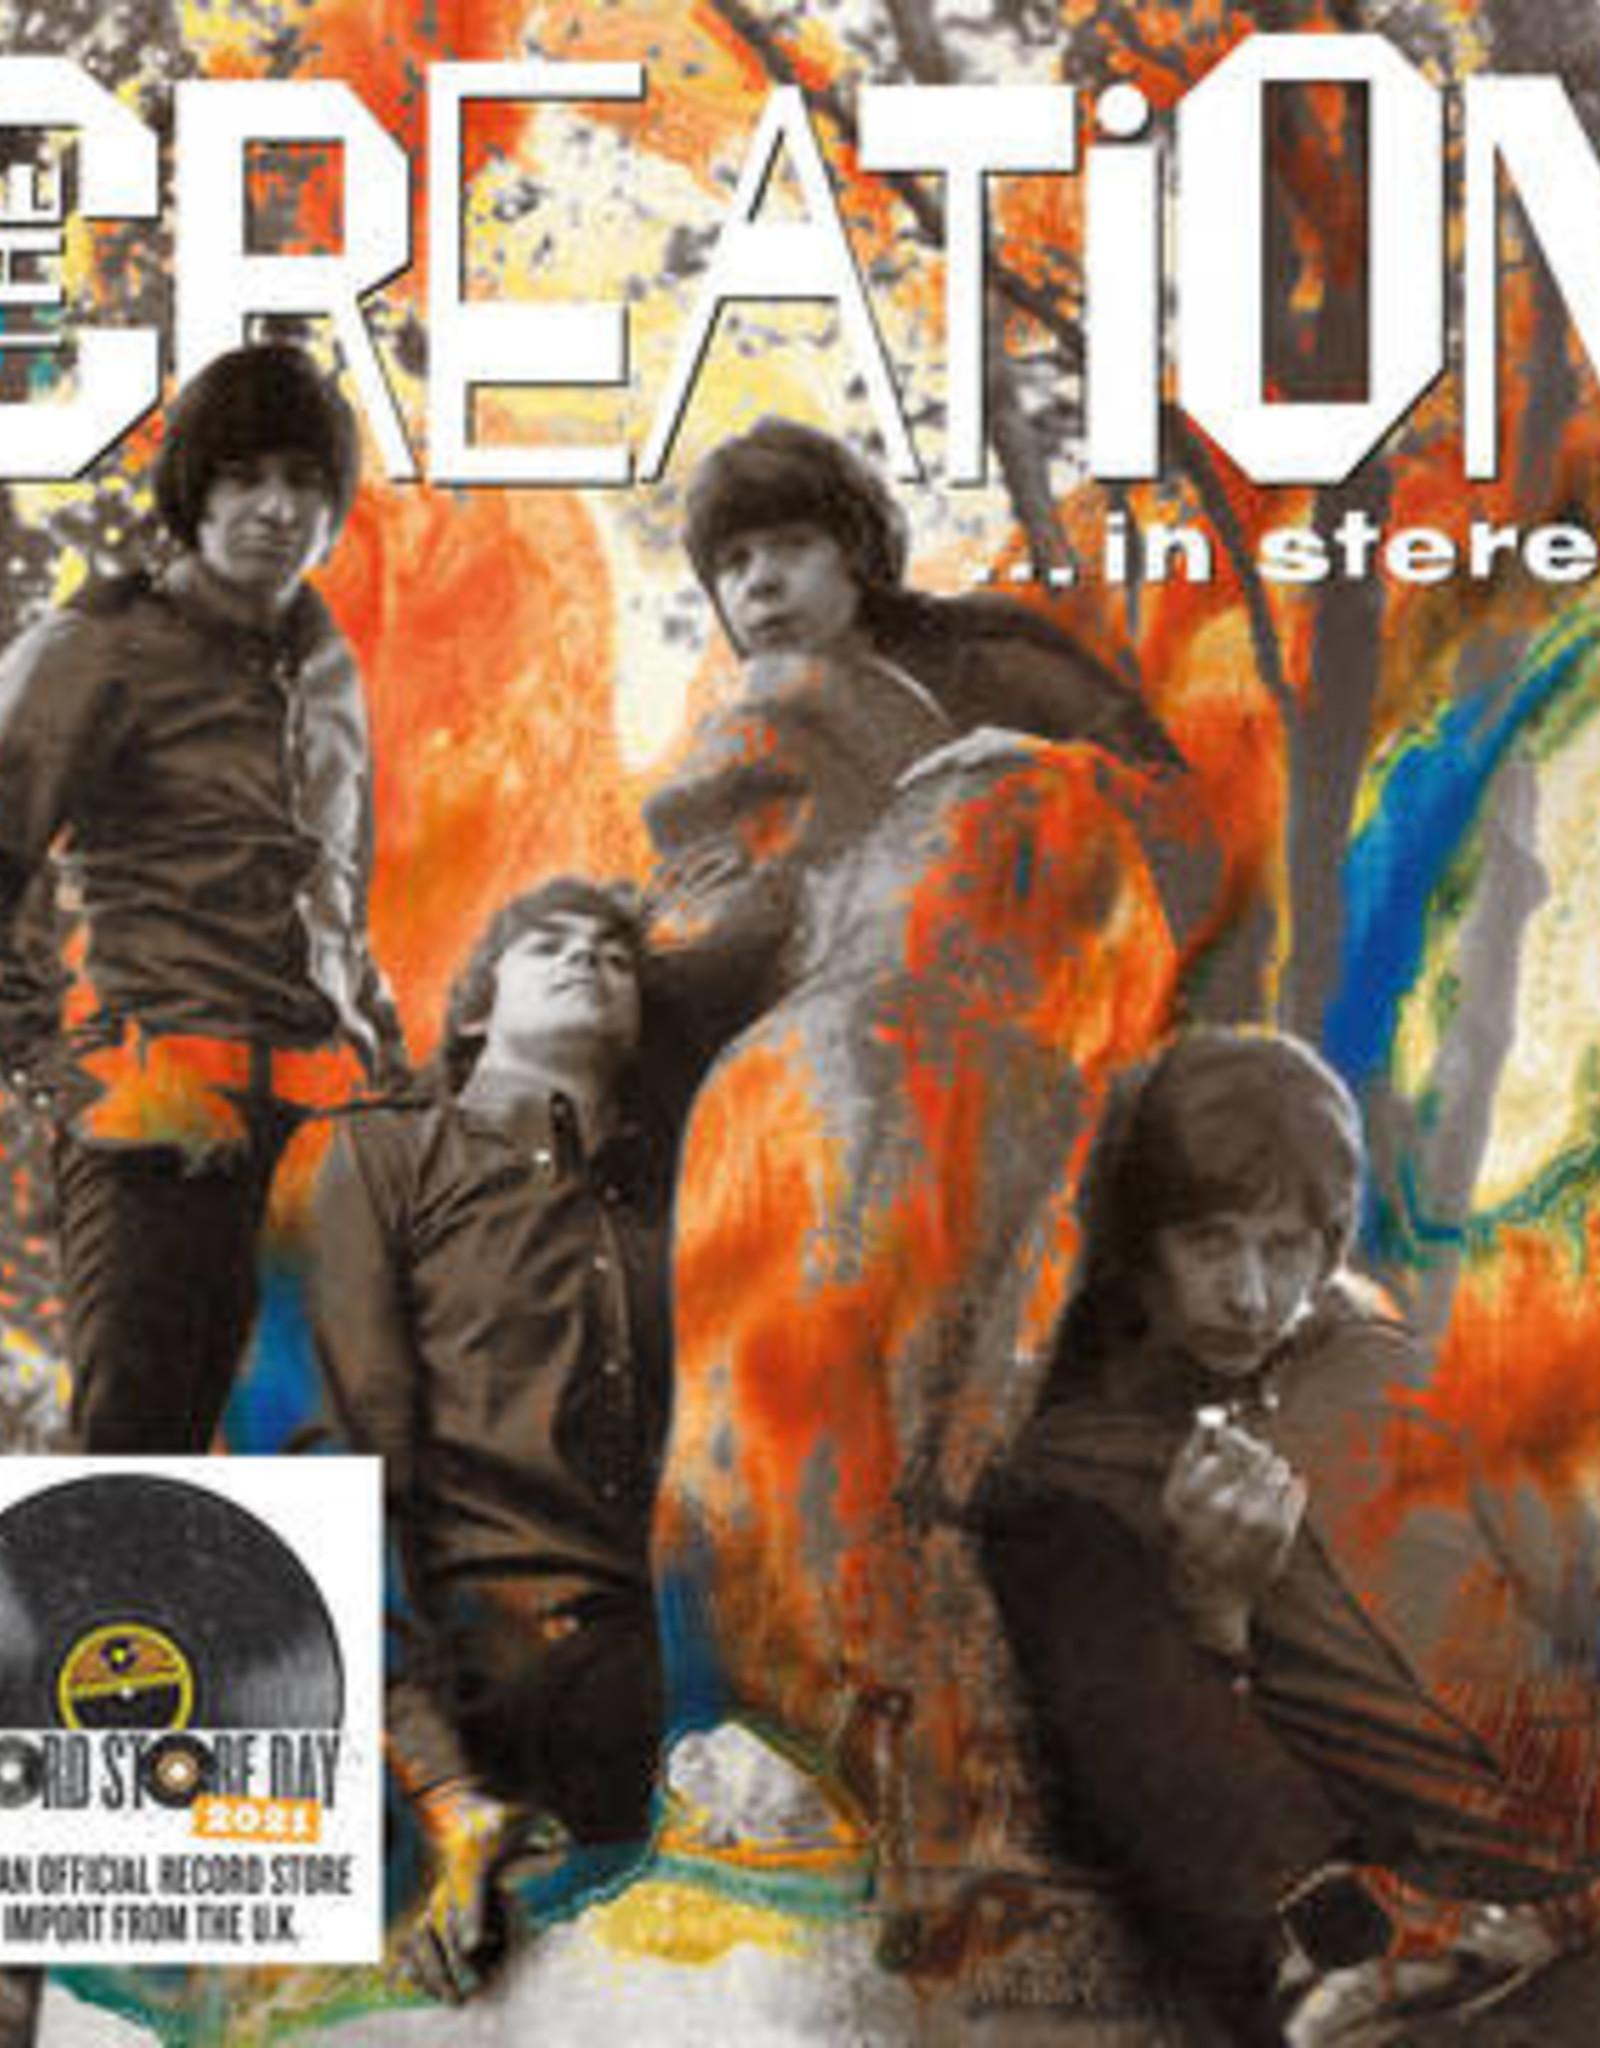 The Creation - In Stereo (180G/2Lp/Psychedelic Splatter Vinyl) (RSD 6/21)